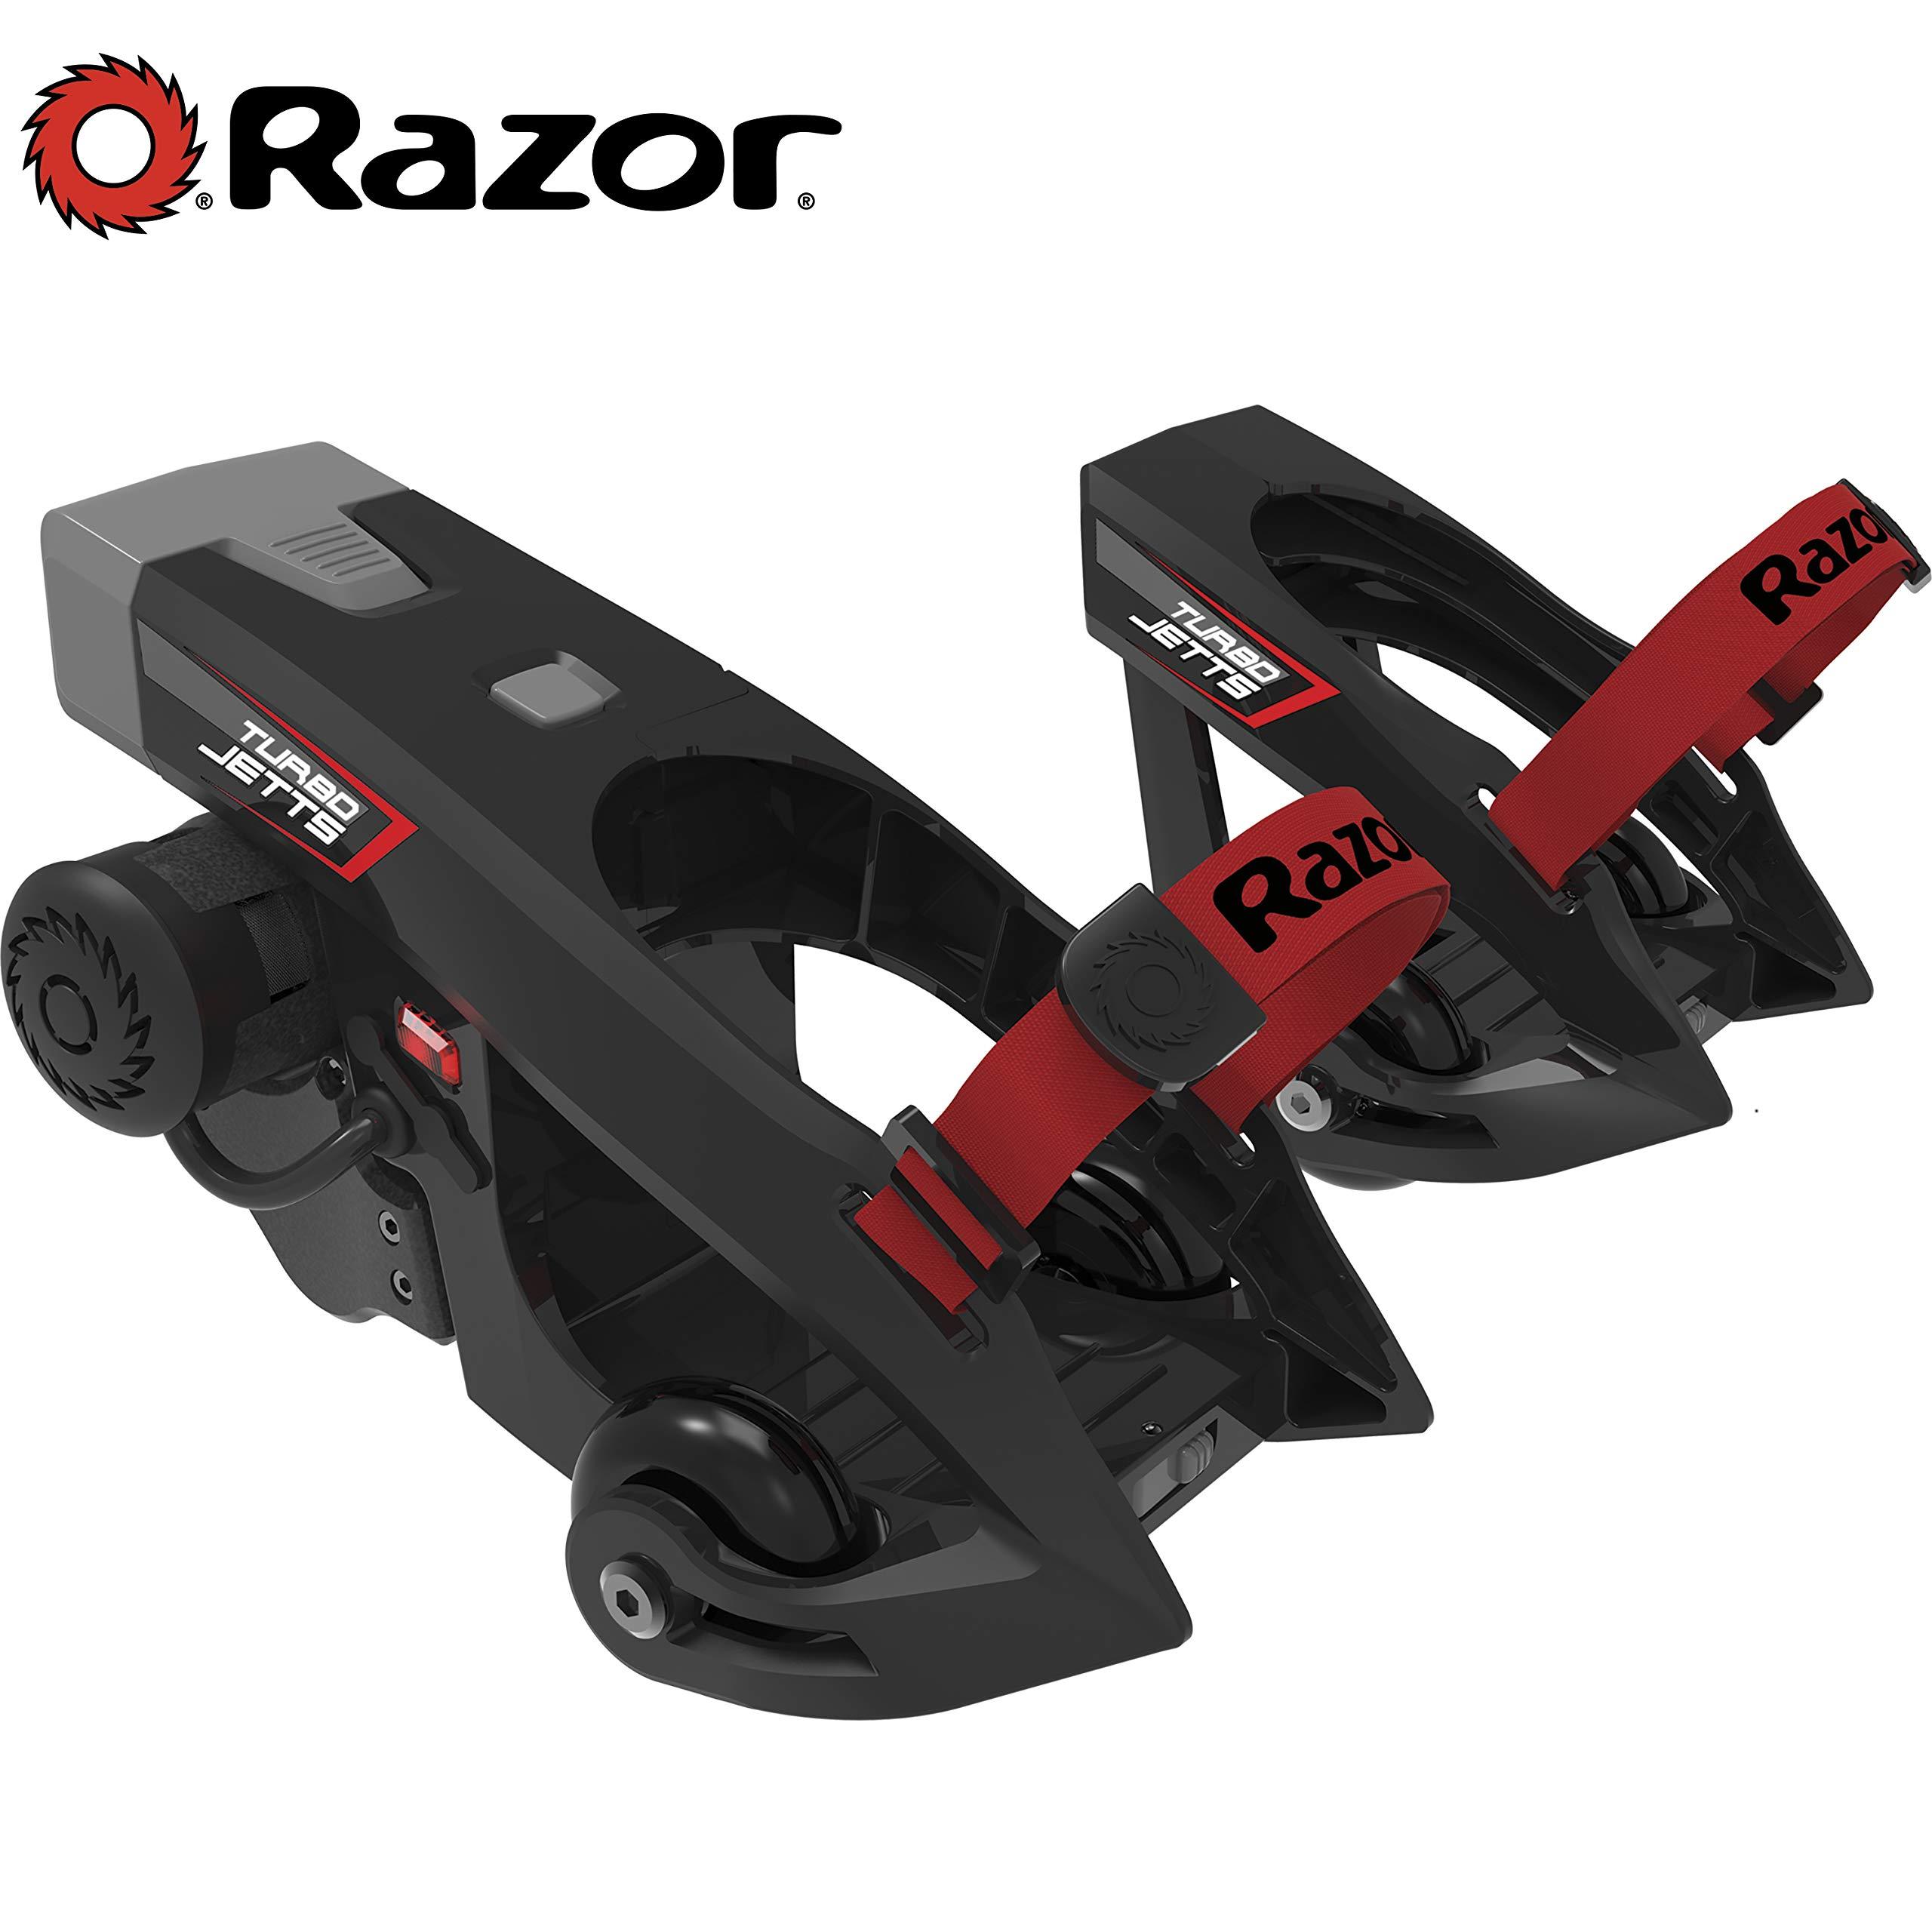 Razor Turbo Jetts Electric Heel Wheels - Red by Razor